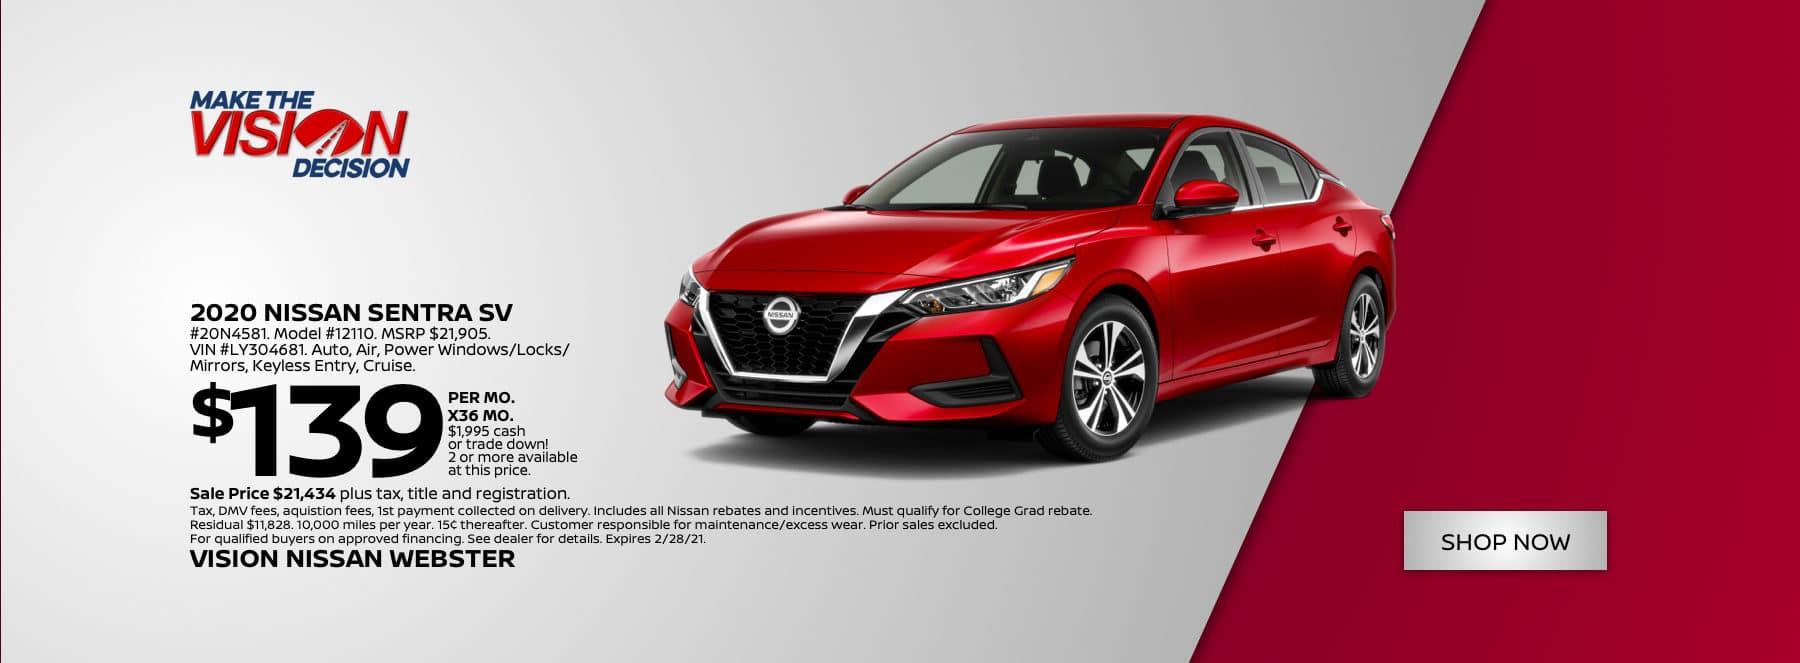 Vision-Nissan-Sliders-0204-Sentra-Web